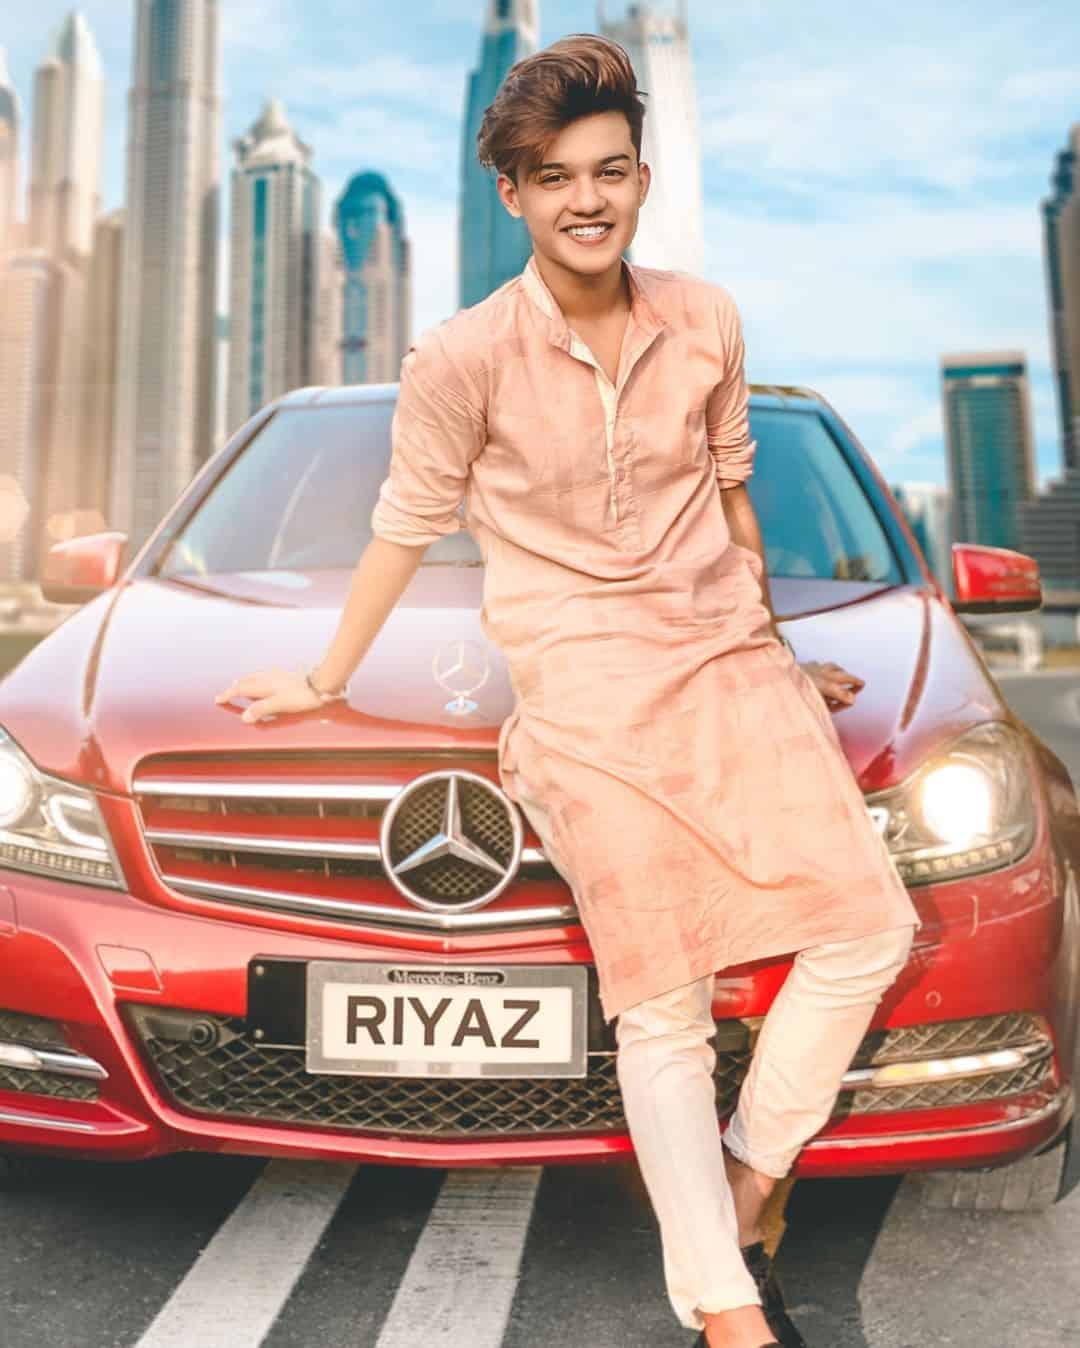 Riyaz Afreen Wiki, Age, Biography, Girlfriends, Family, Hobbies, & More 4